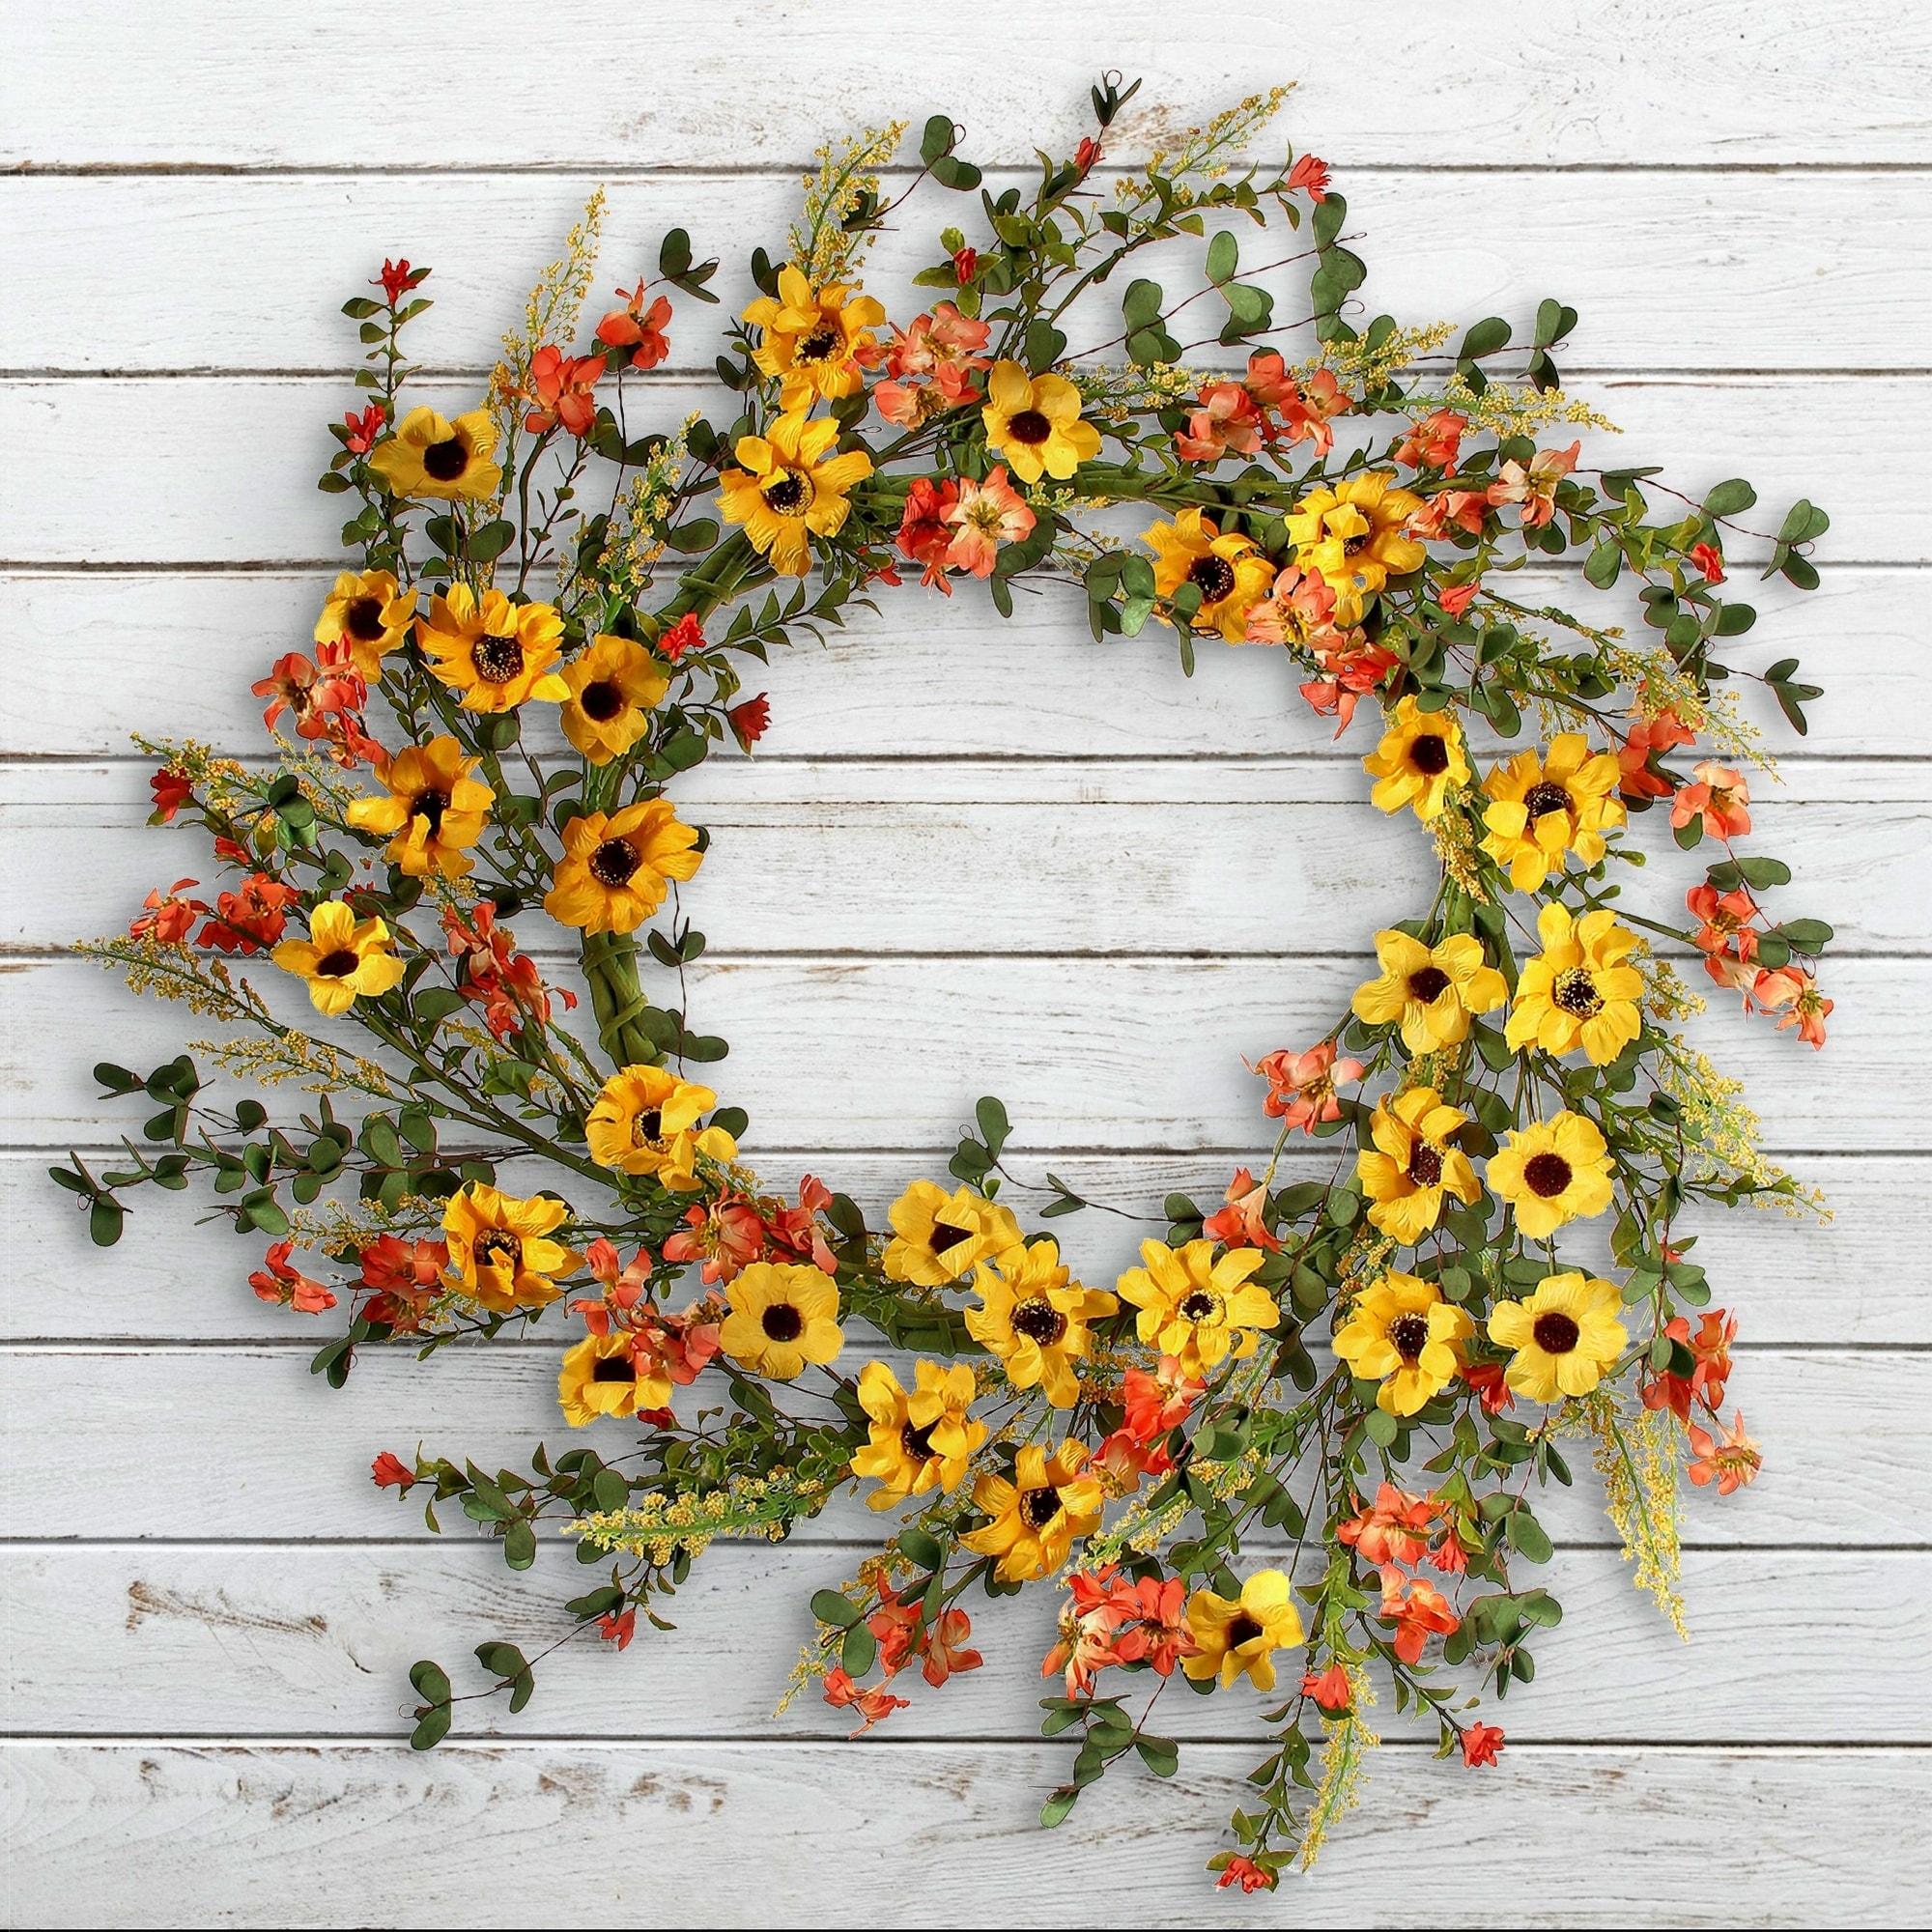 Aster/Primrose Wreath 22 (Yellow and Orange)